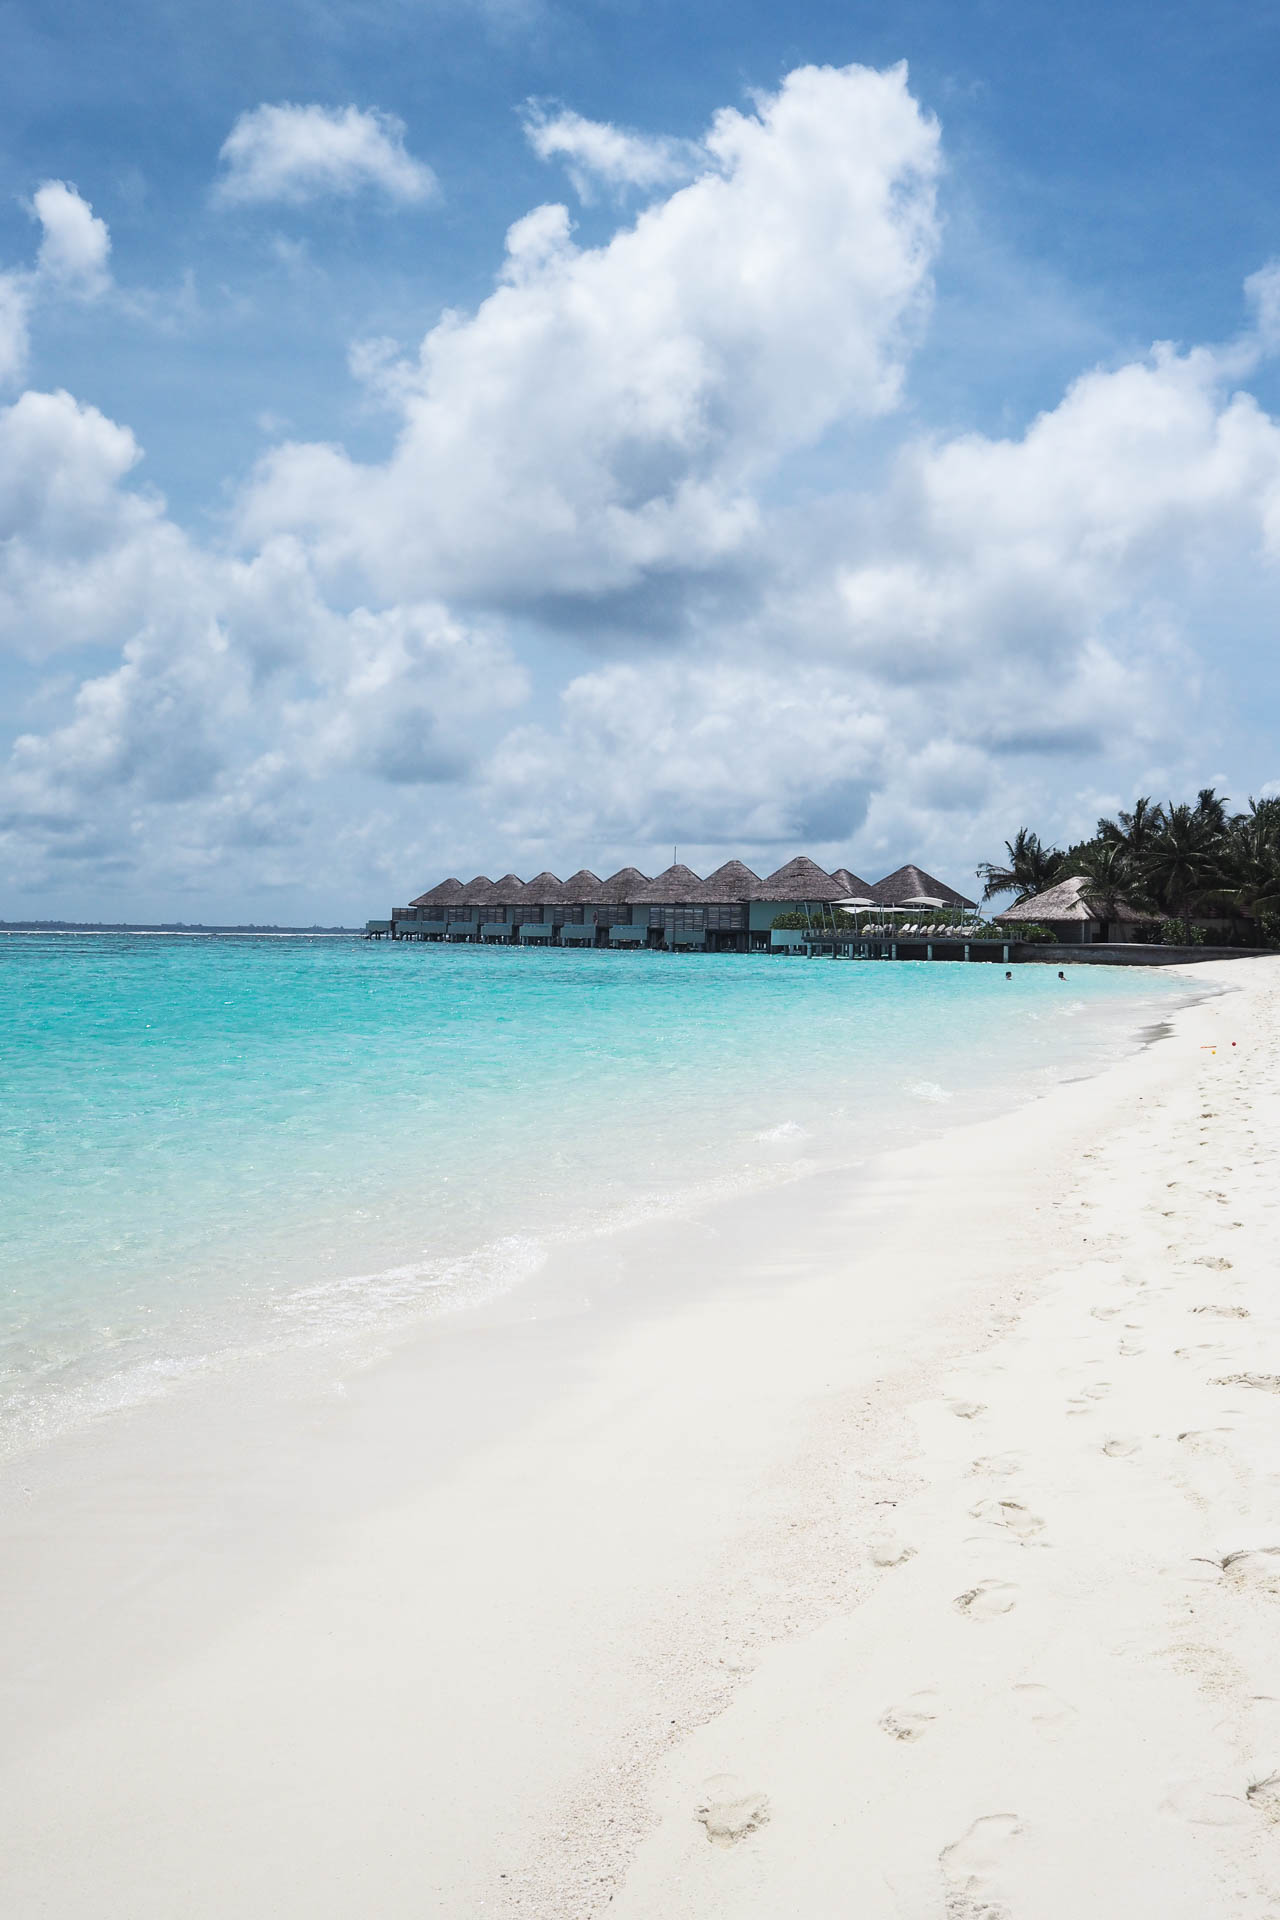 maldives for less, maldives on a budget